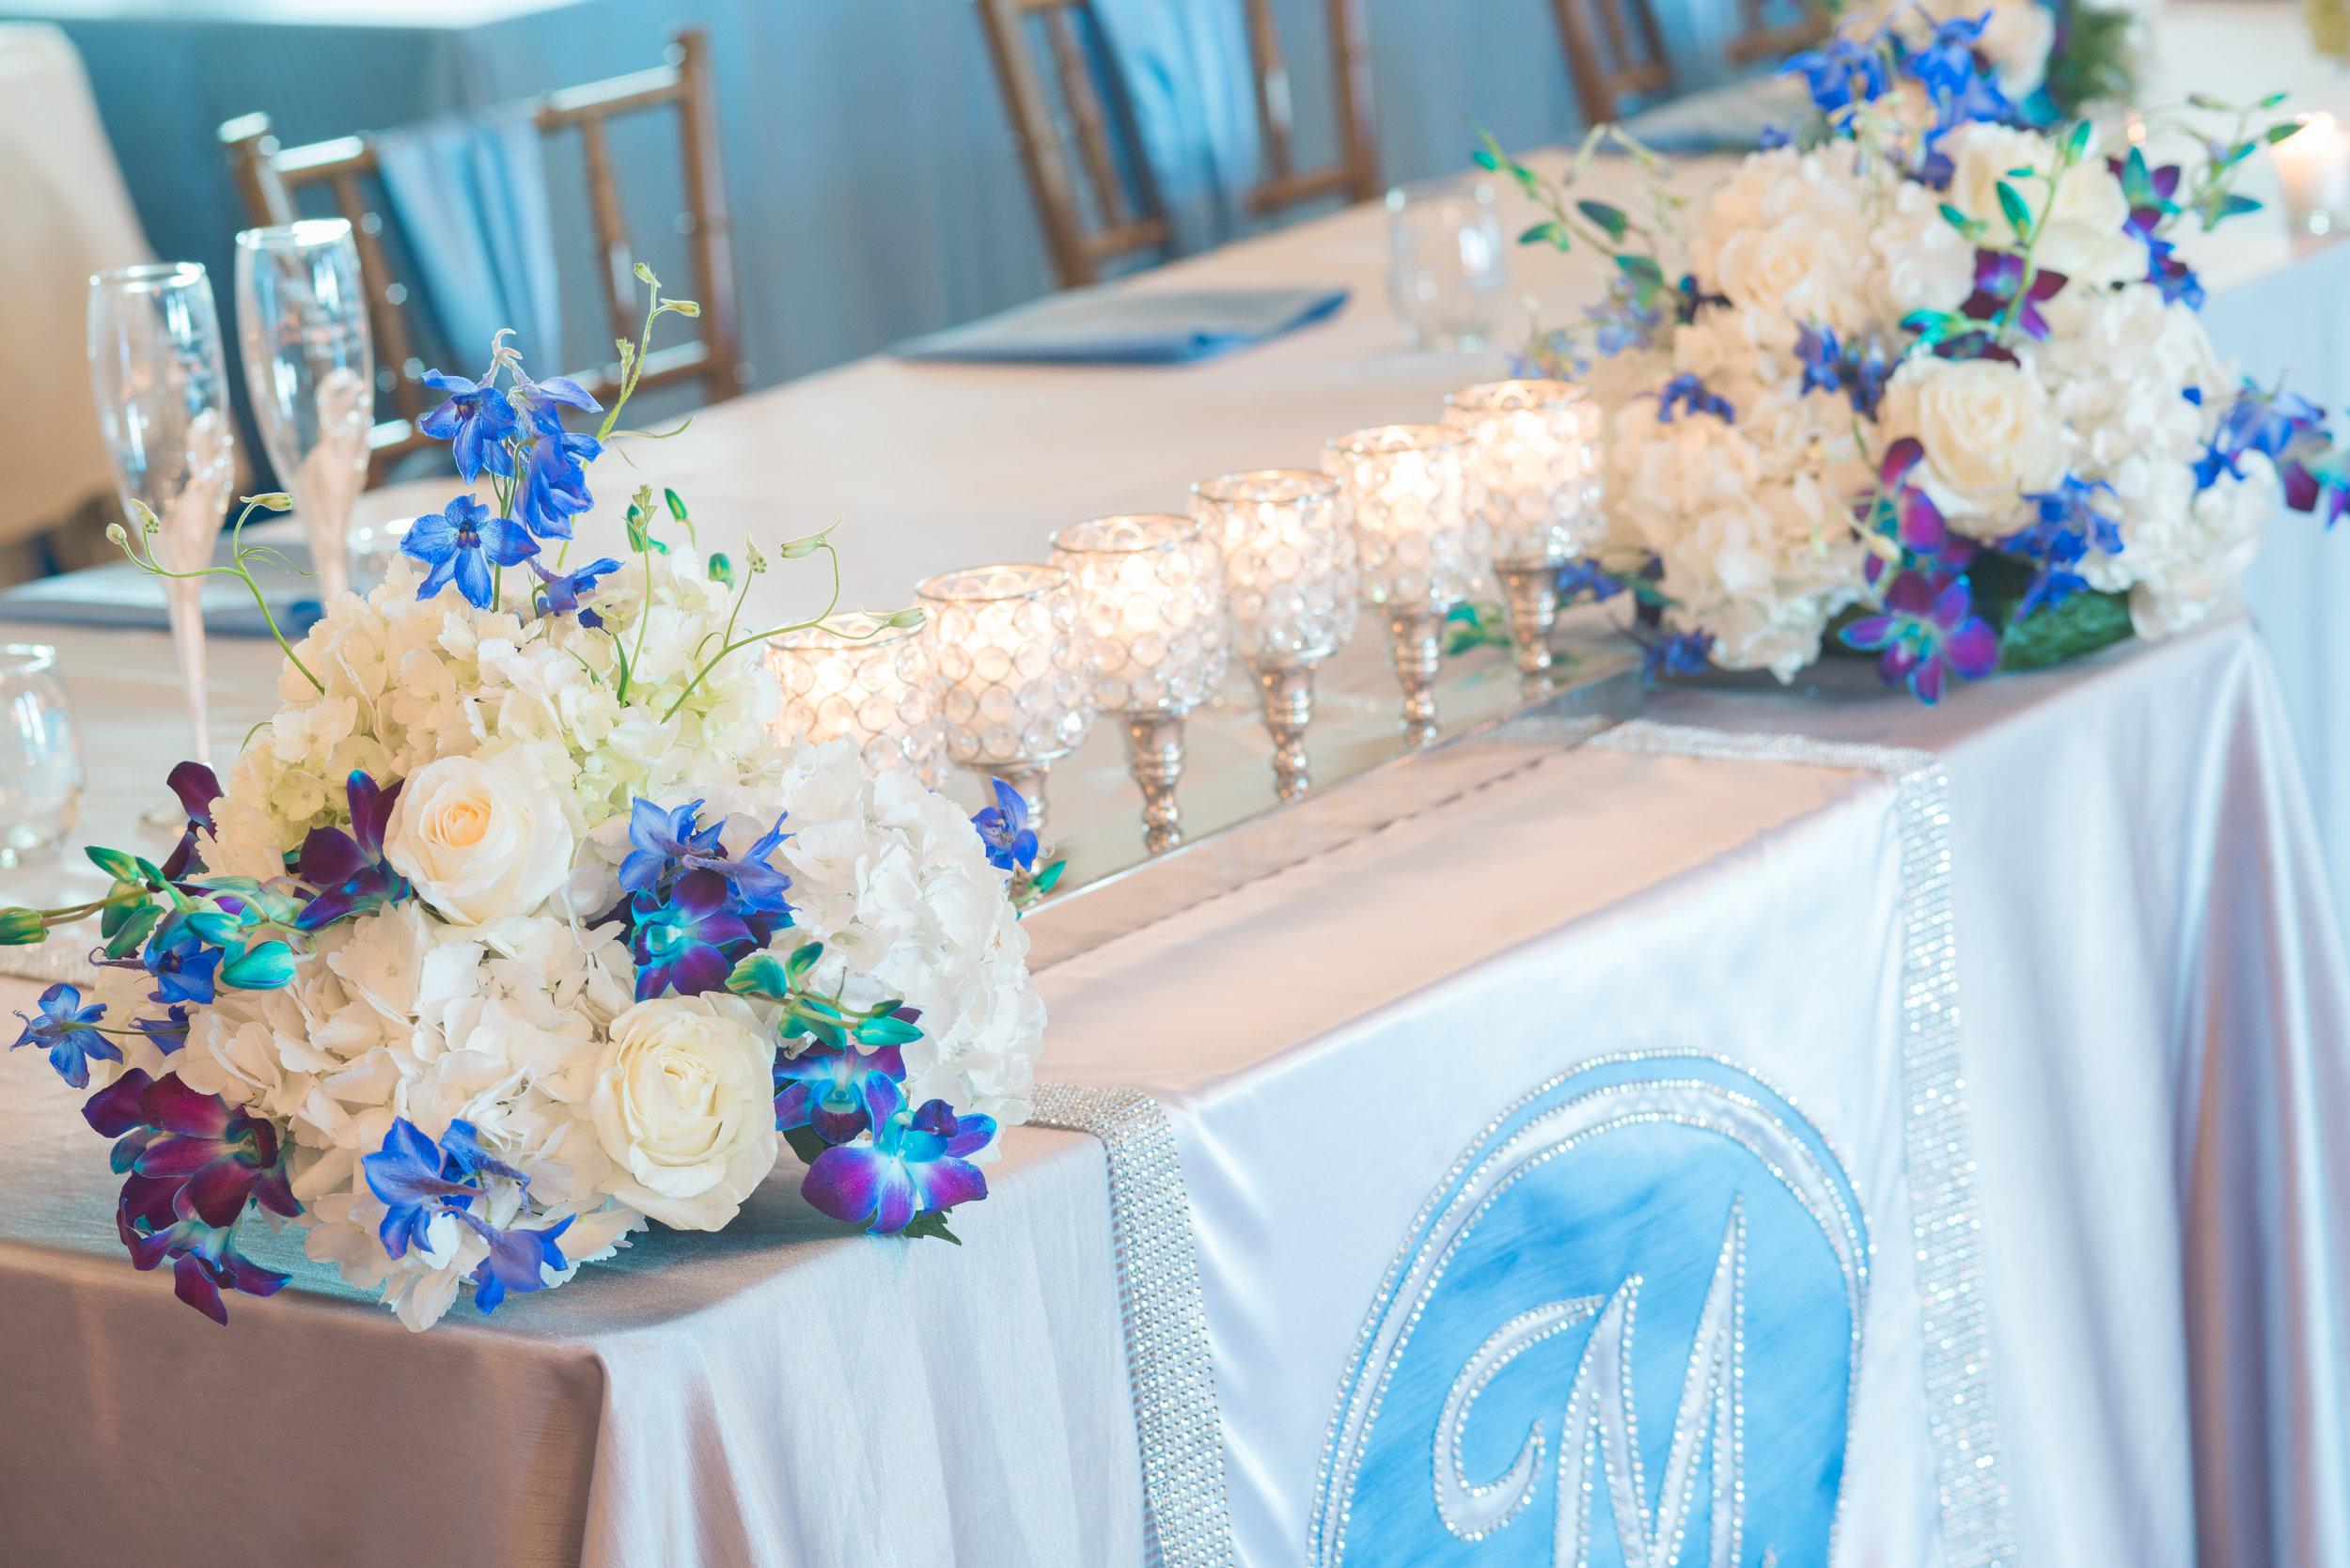 Carl-Kerridge-Photography-North-Beach-Wedding-May-2015-021.jpg